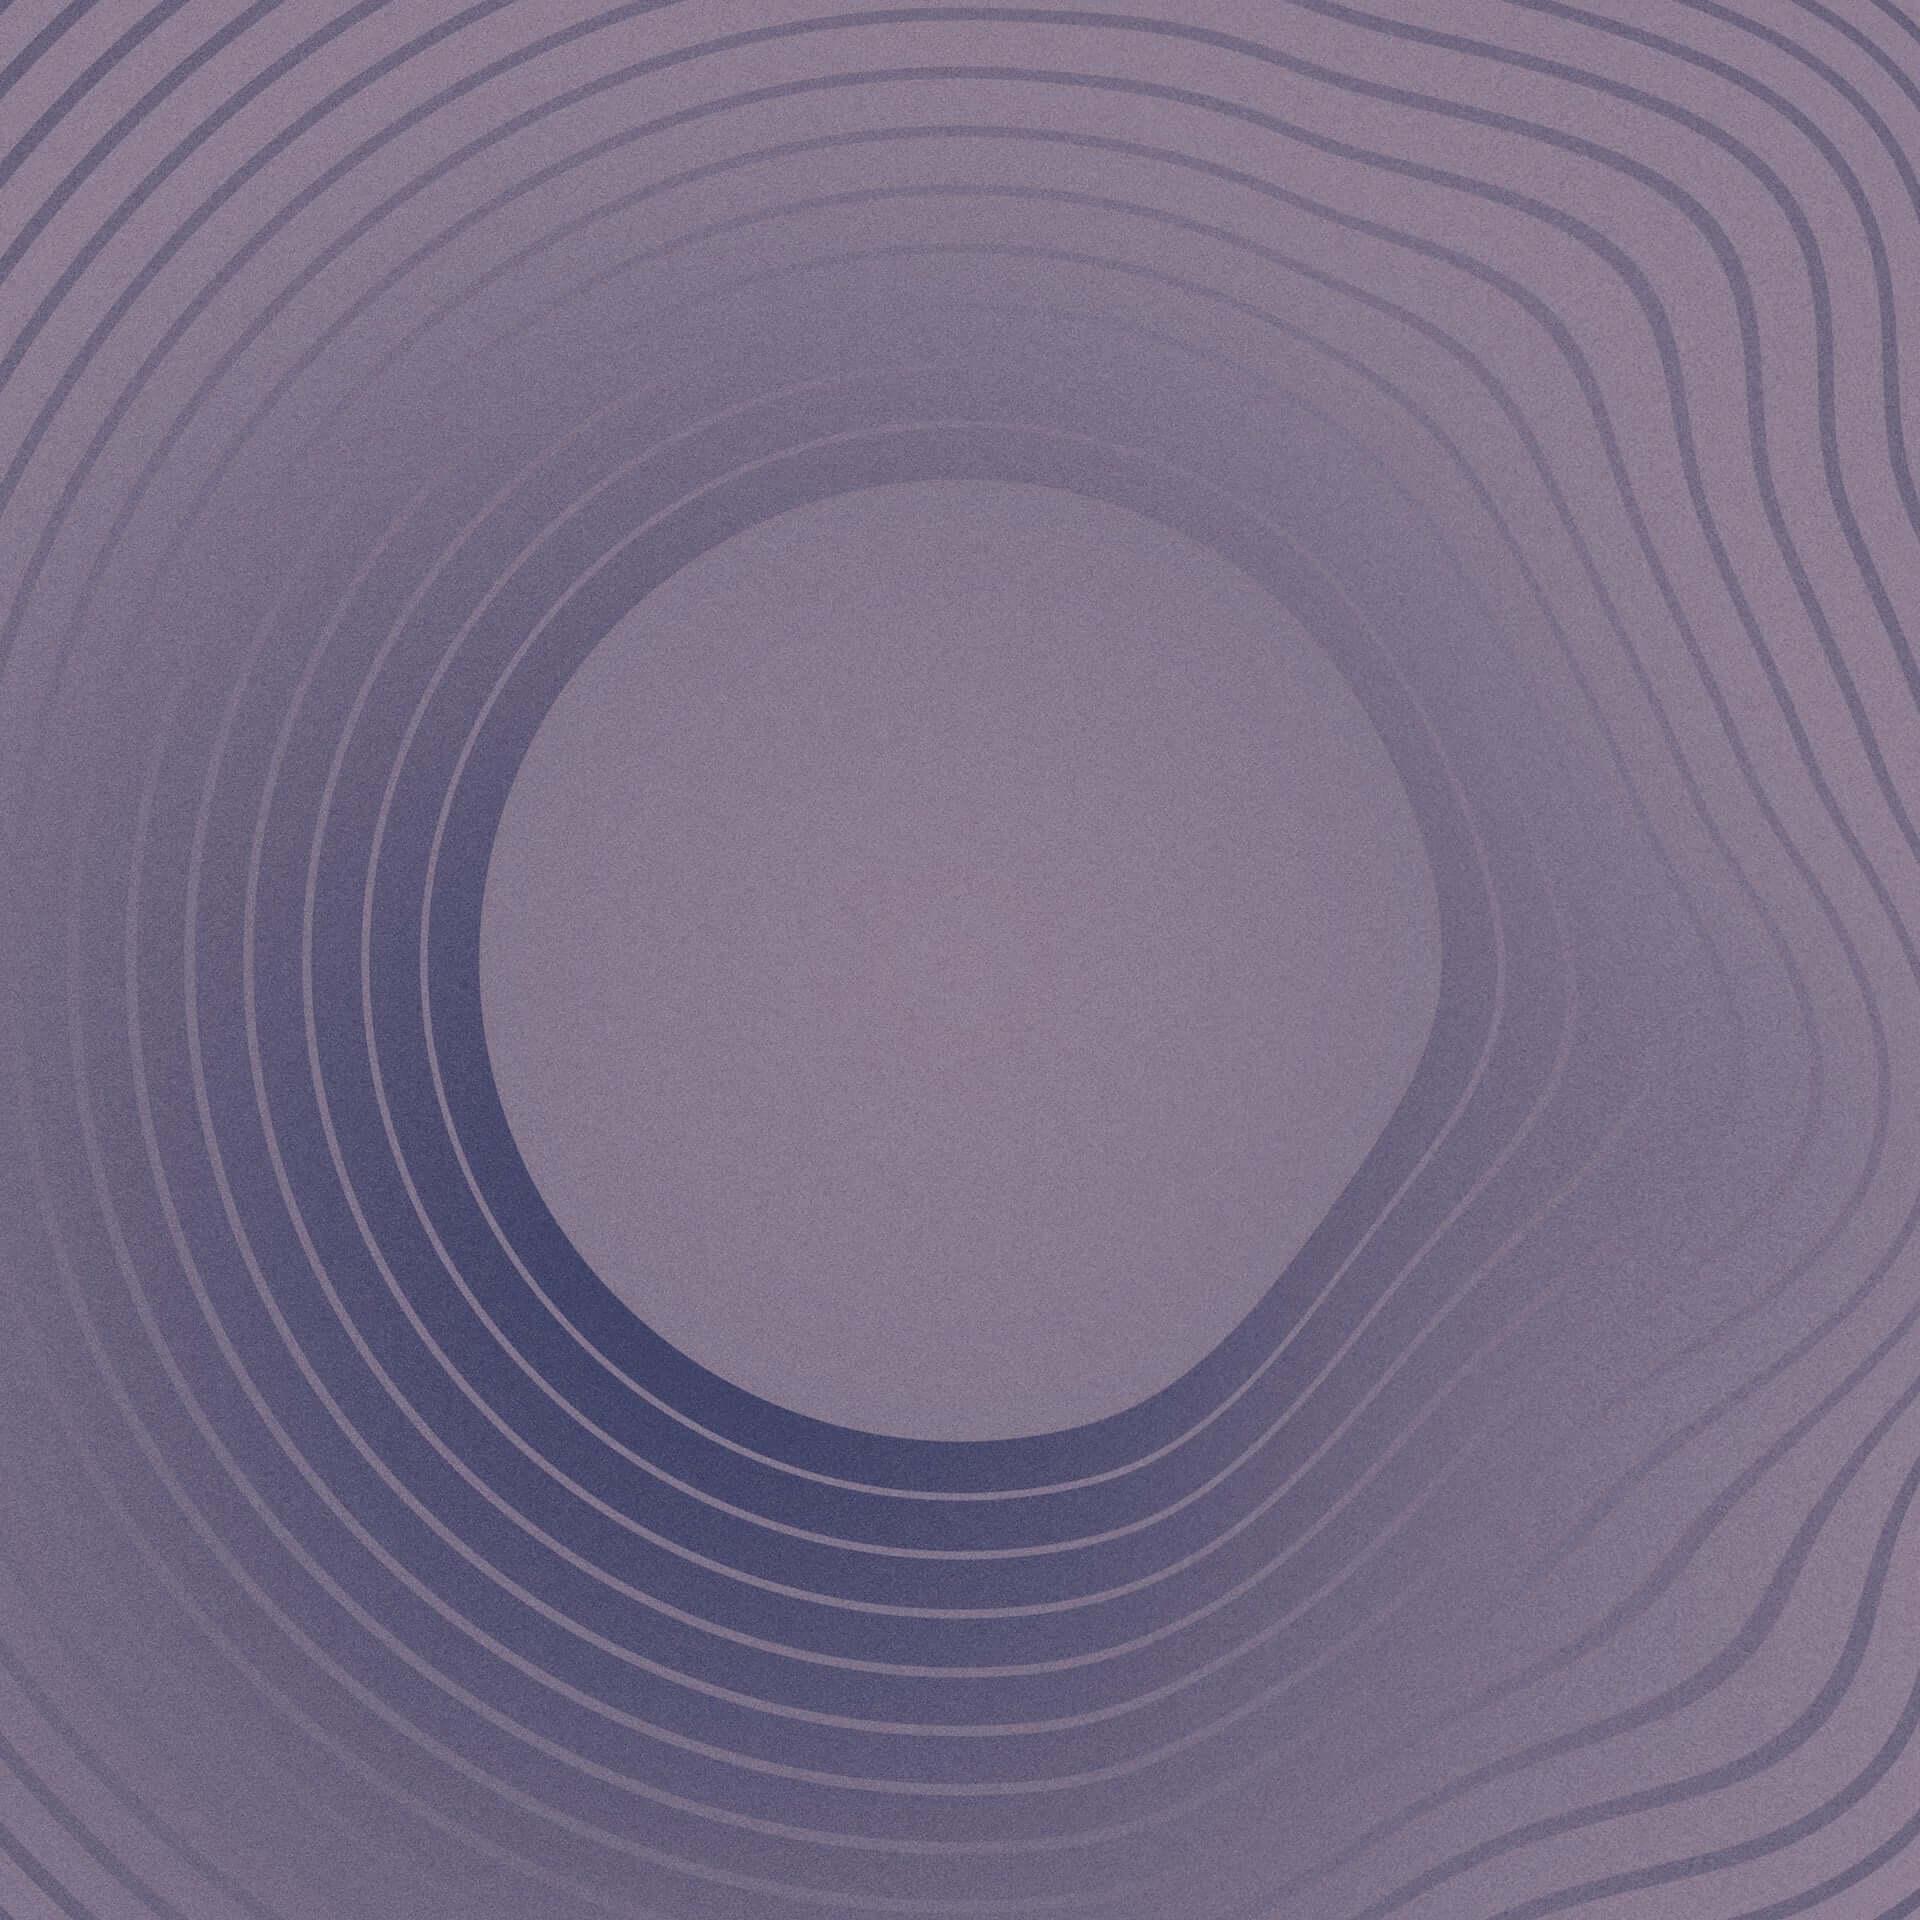 "erie&FKDの新曲""Intuition""がデジタルリリース!Shinji ItoUによるアートワークを施したTシャツも発売 music210225_erie_1-1920x1920"